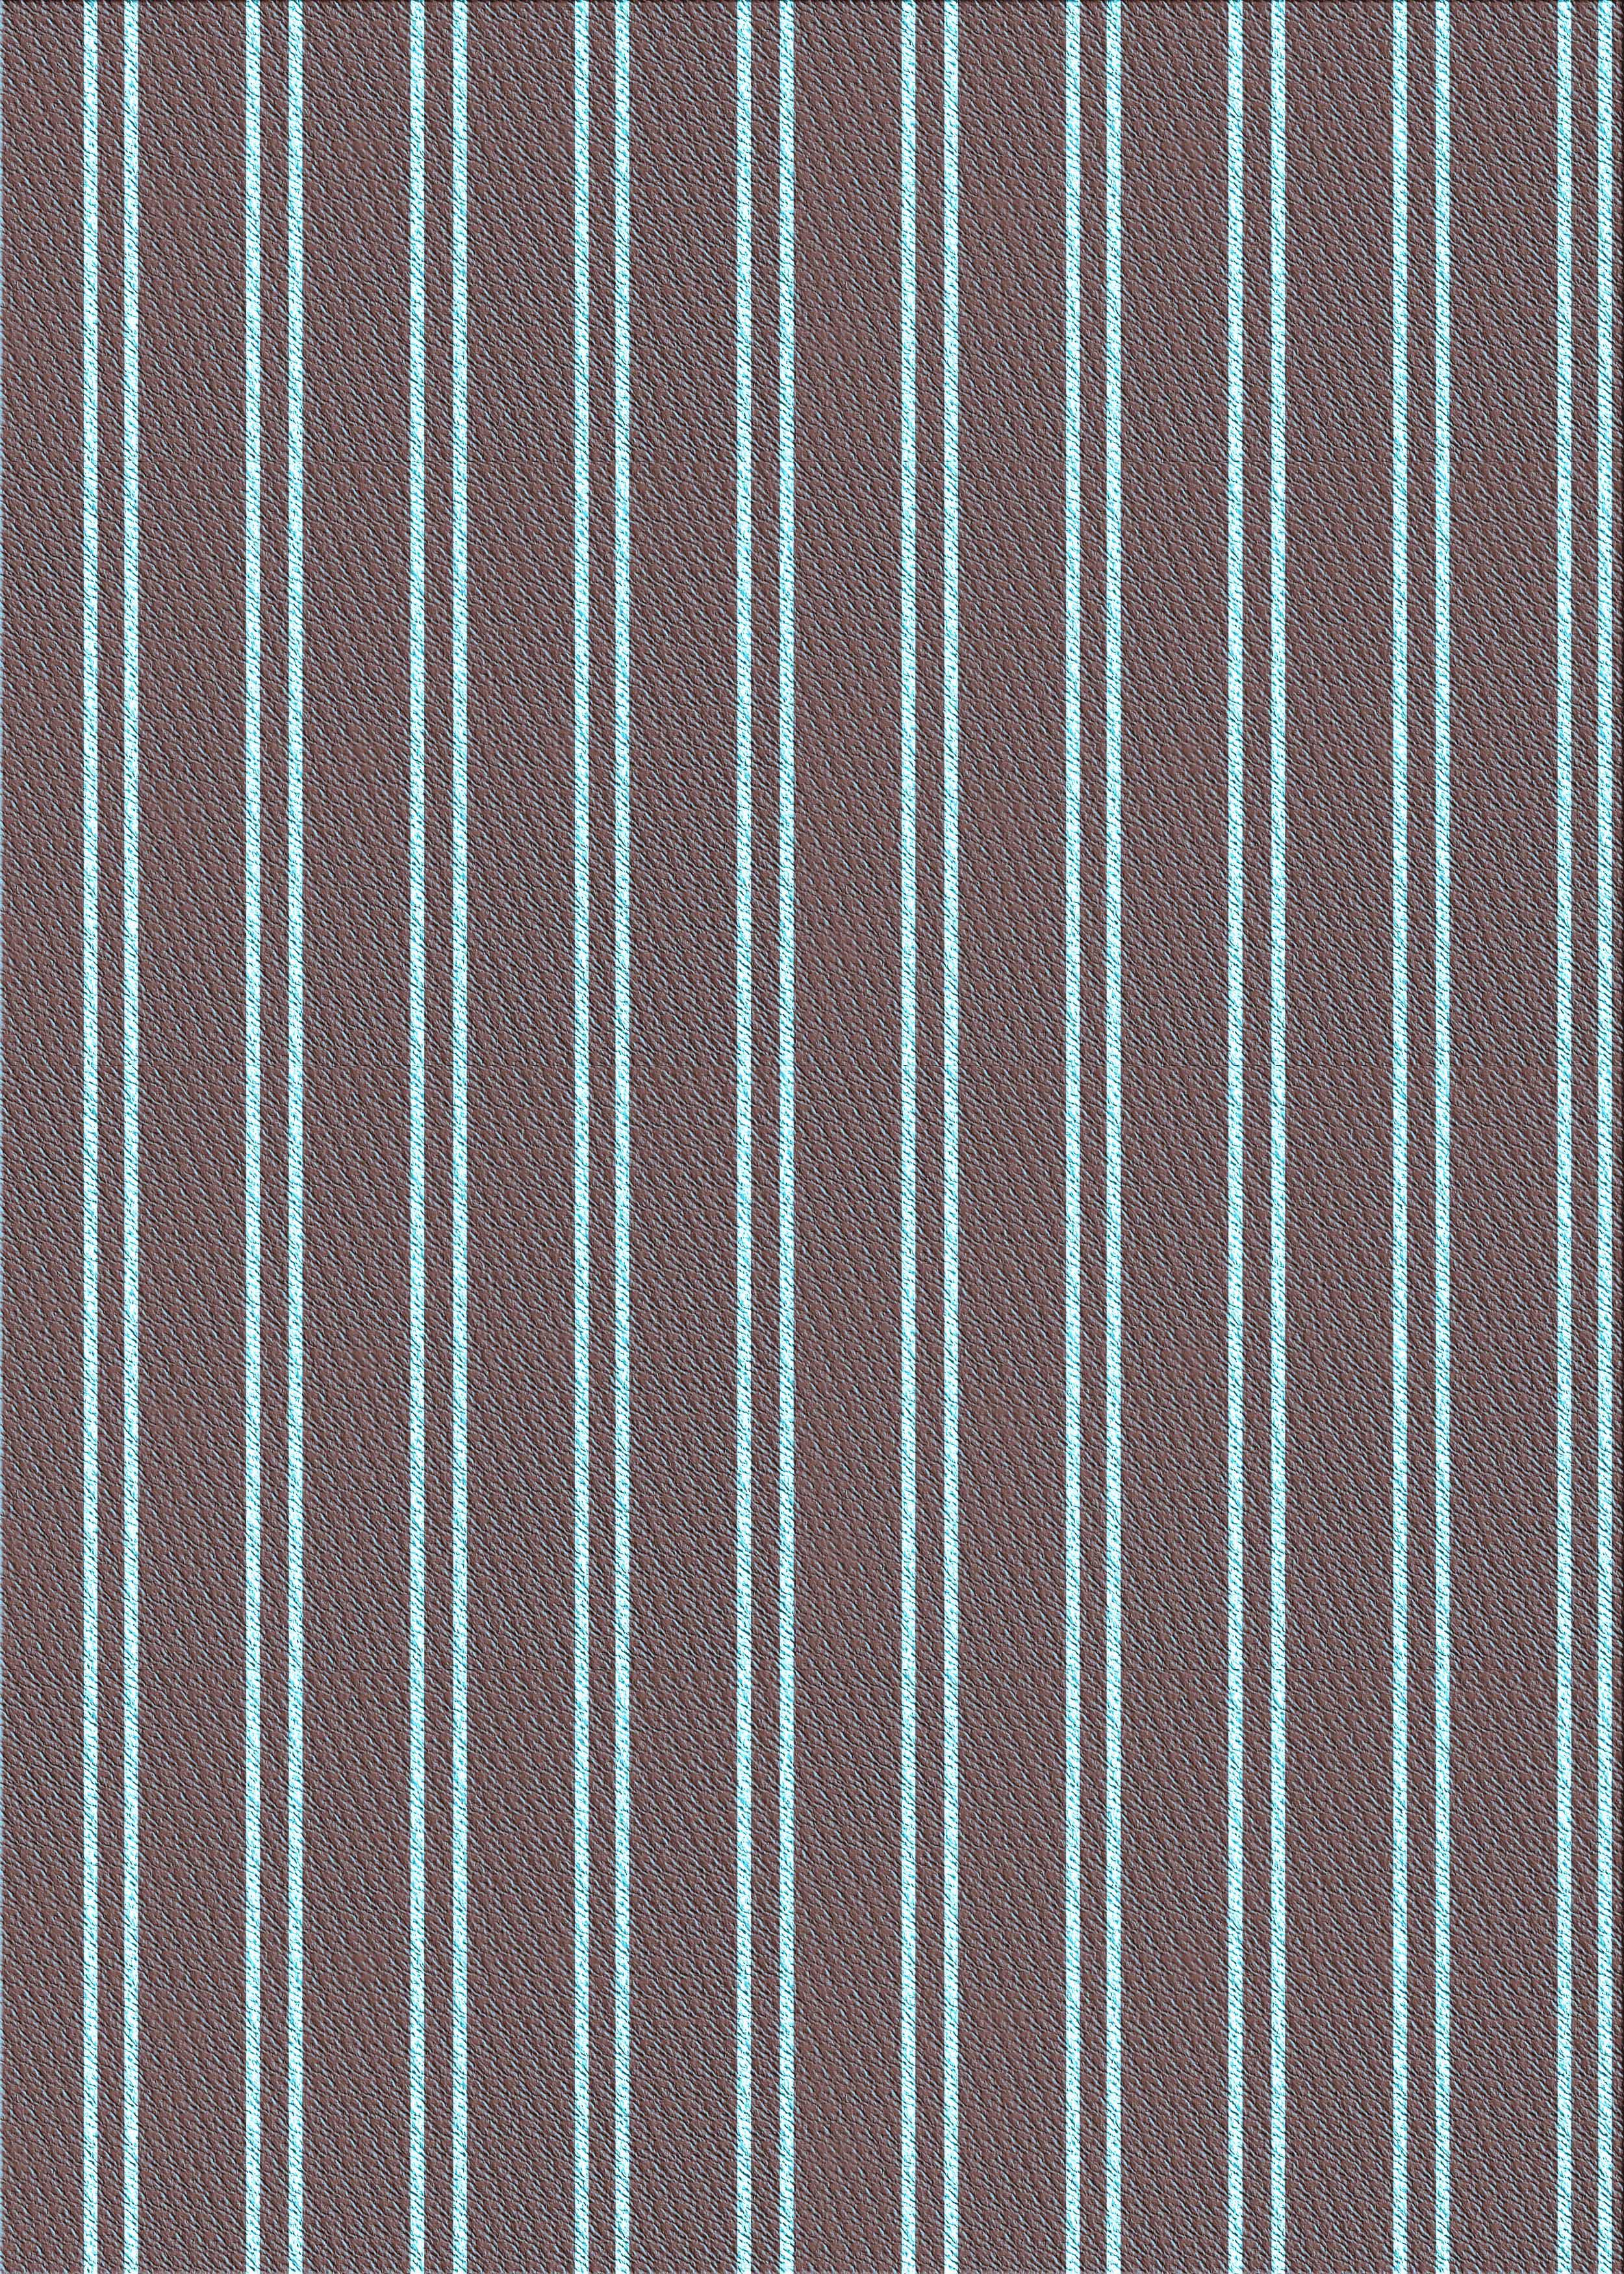 East Urban Home Rukhsar Striped Wool Brown Light Blue Area Rug Wayfair